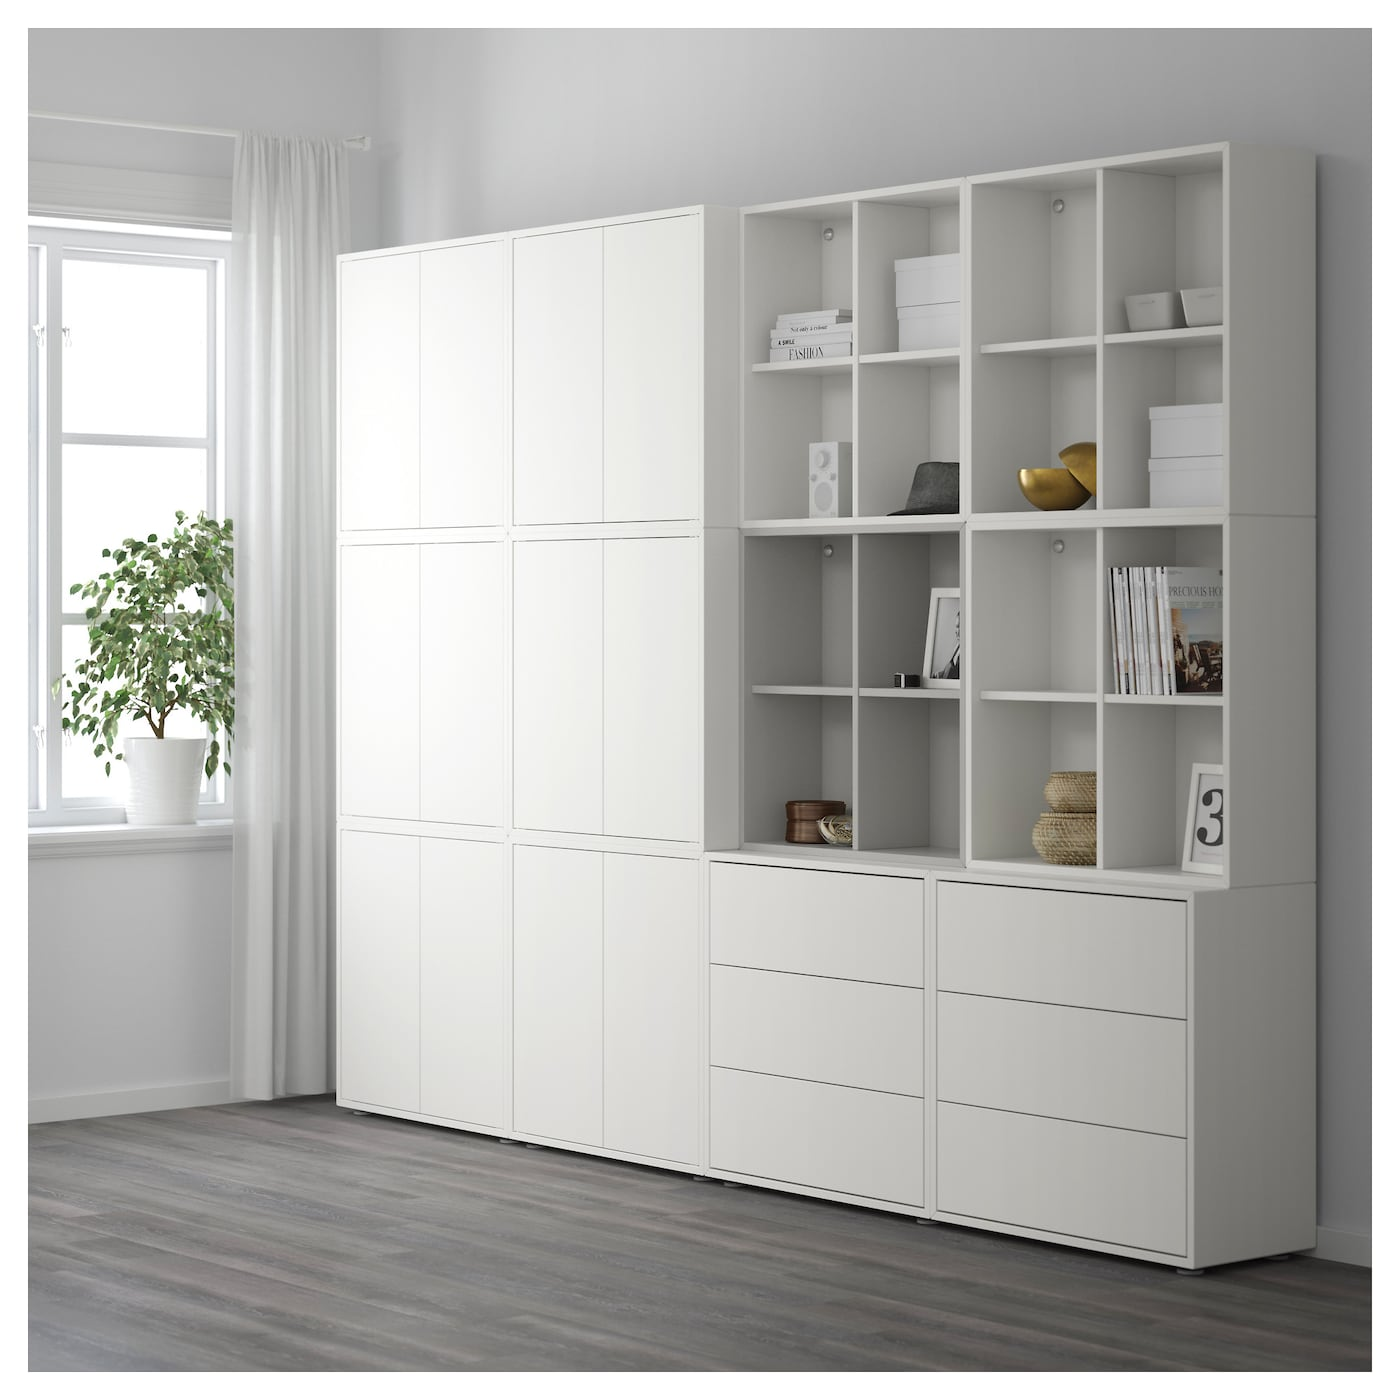 eket cabinet combination with feet white light grey 280 x 35 x 212 cm ikea. Black Bedroom Furniture Sets. Home Design Ideas